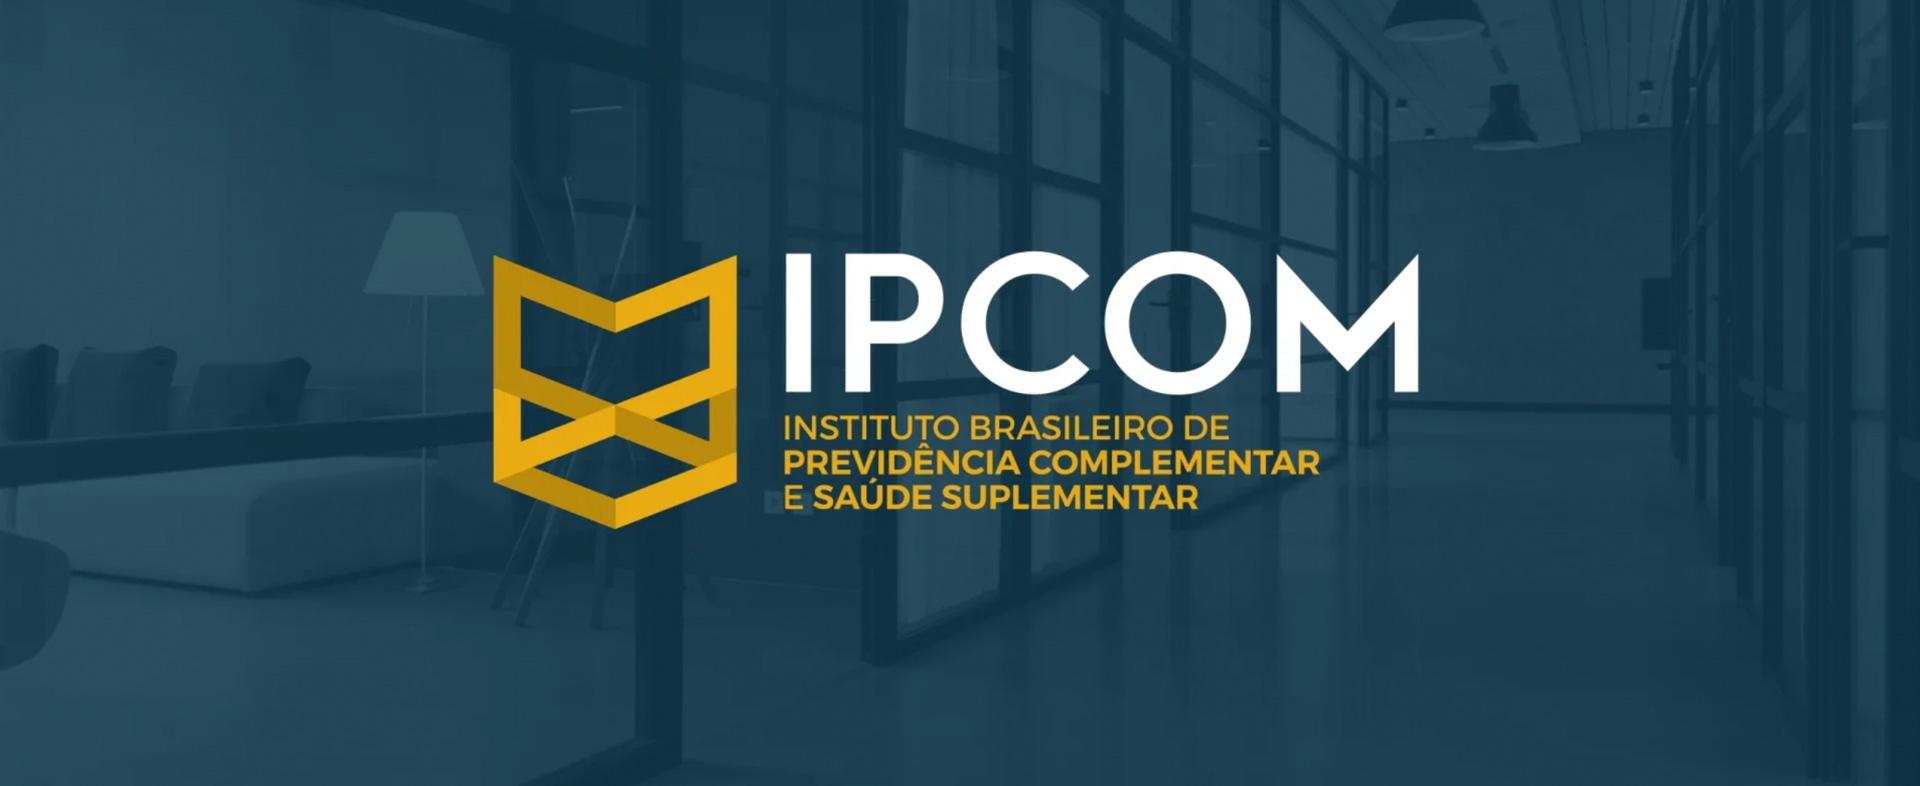 IPCOM